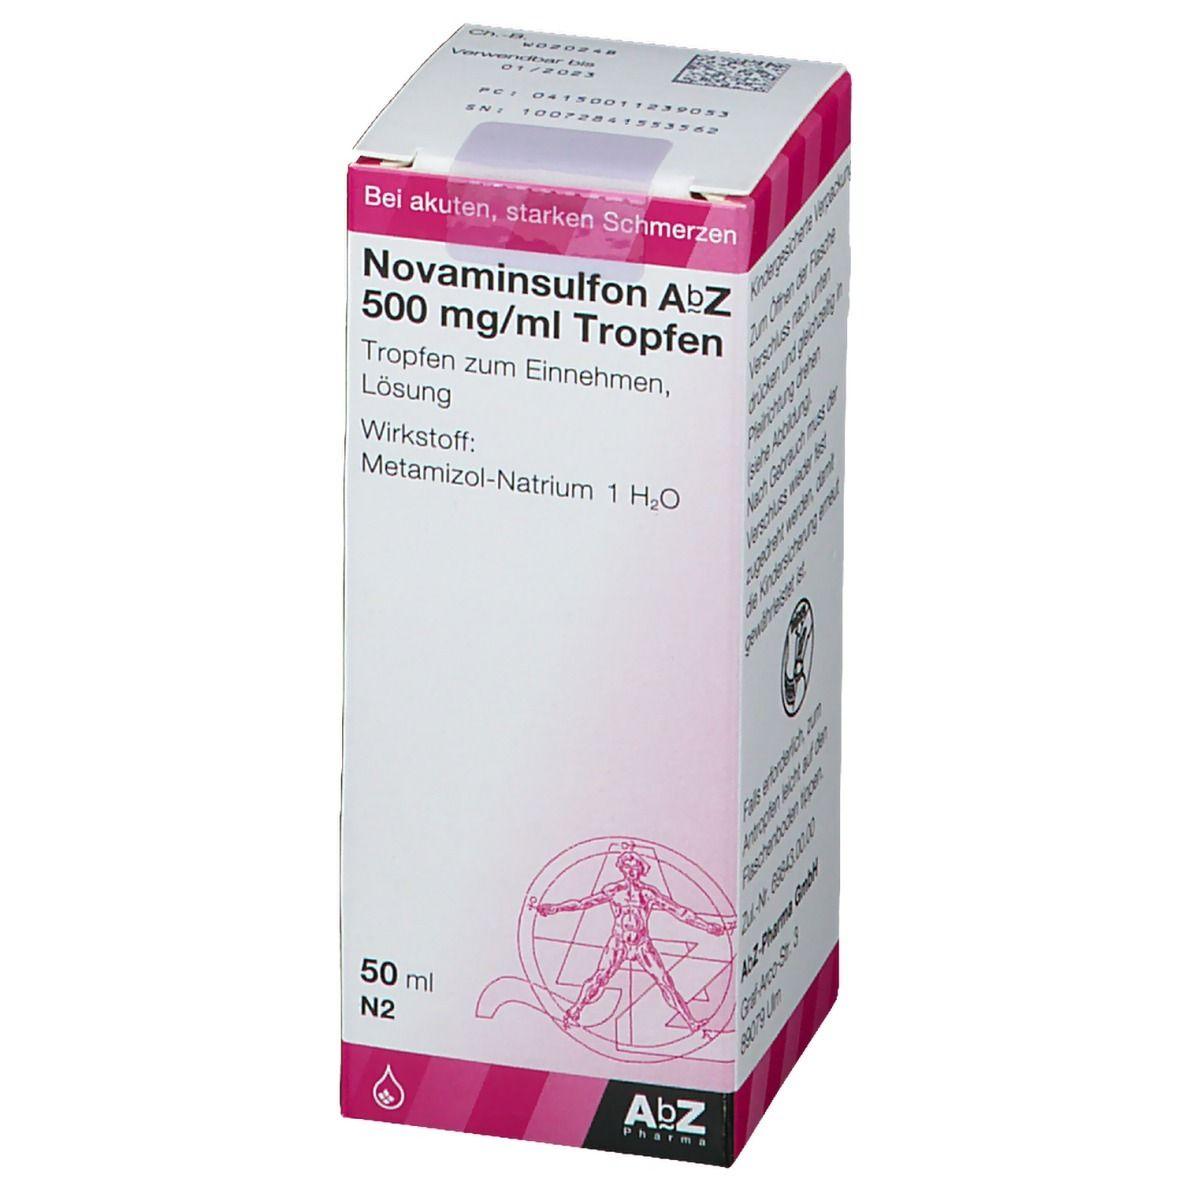 NOVAMINSULFON AbZ 500 mg/ml